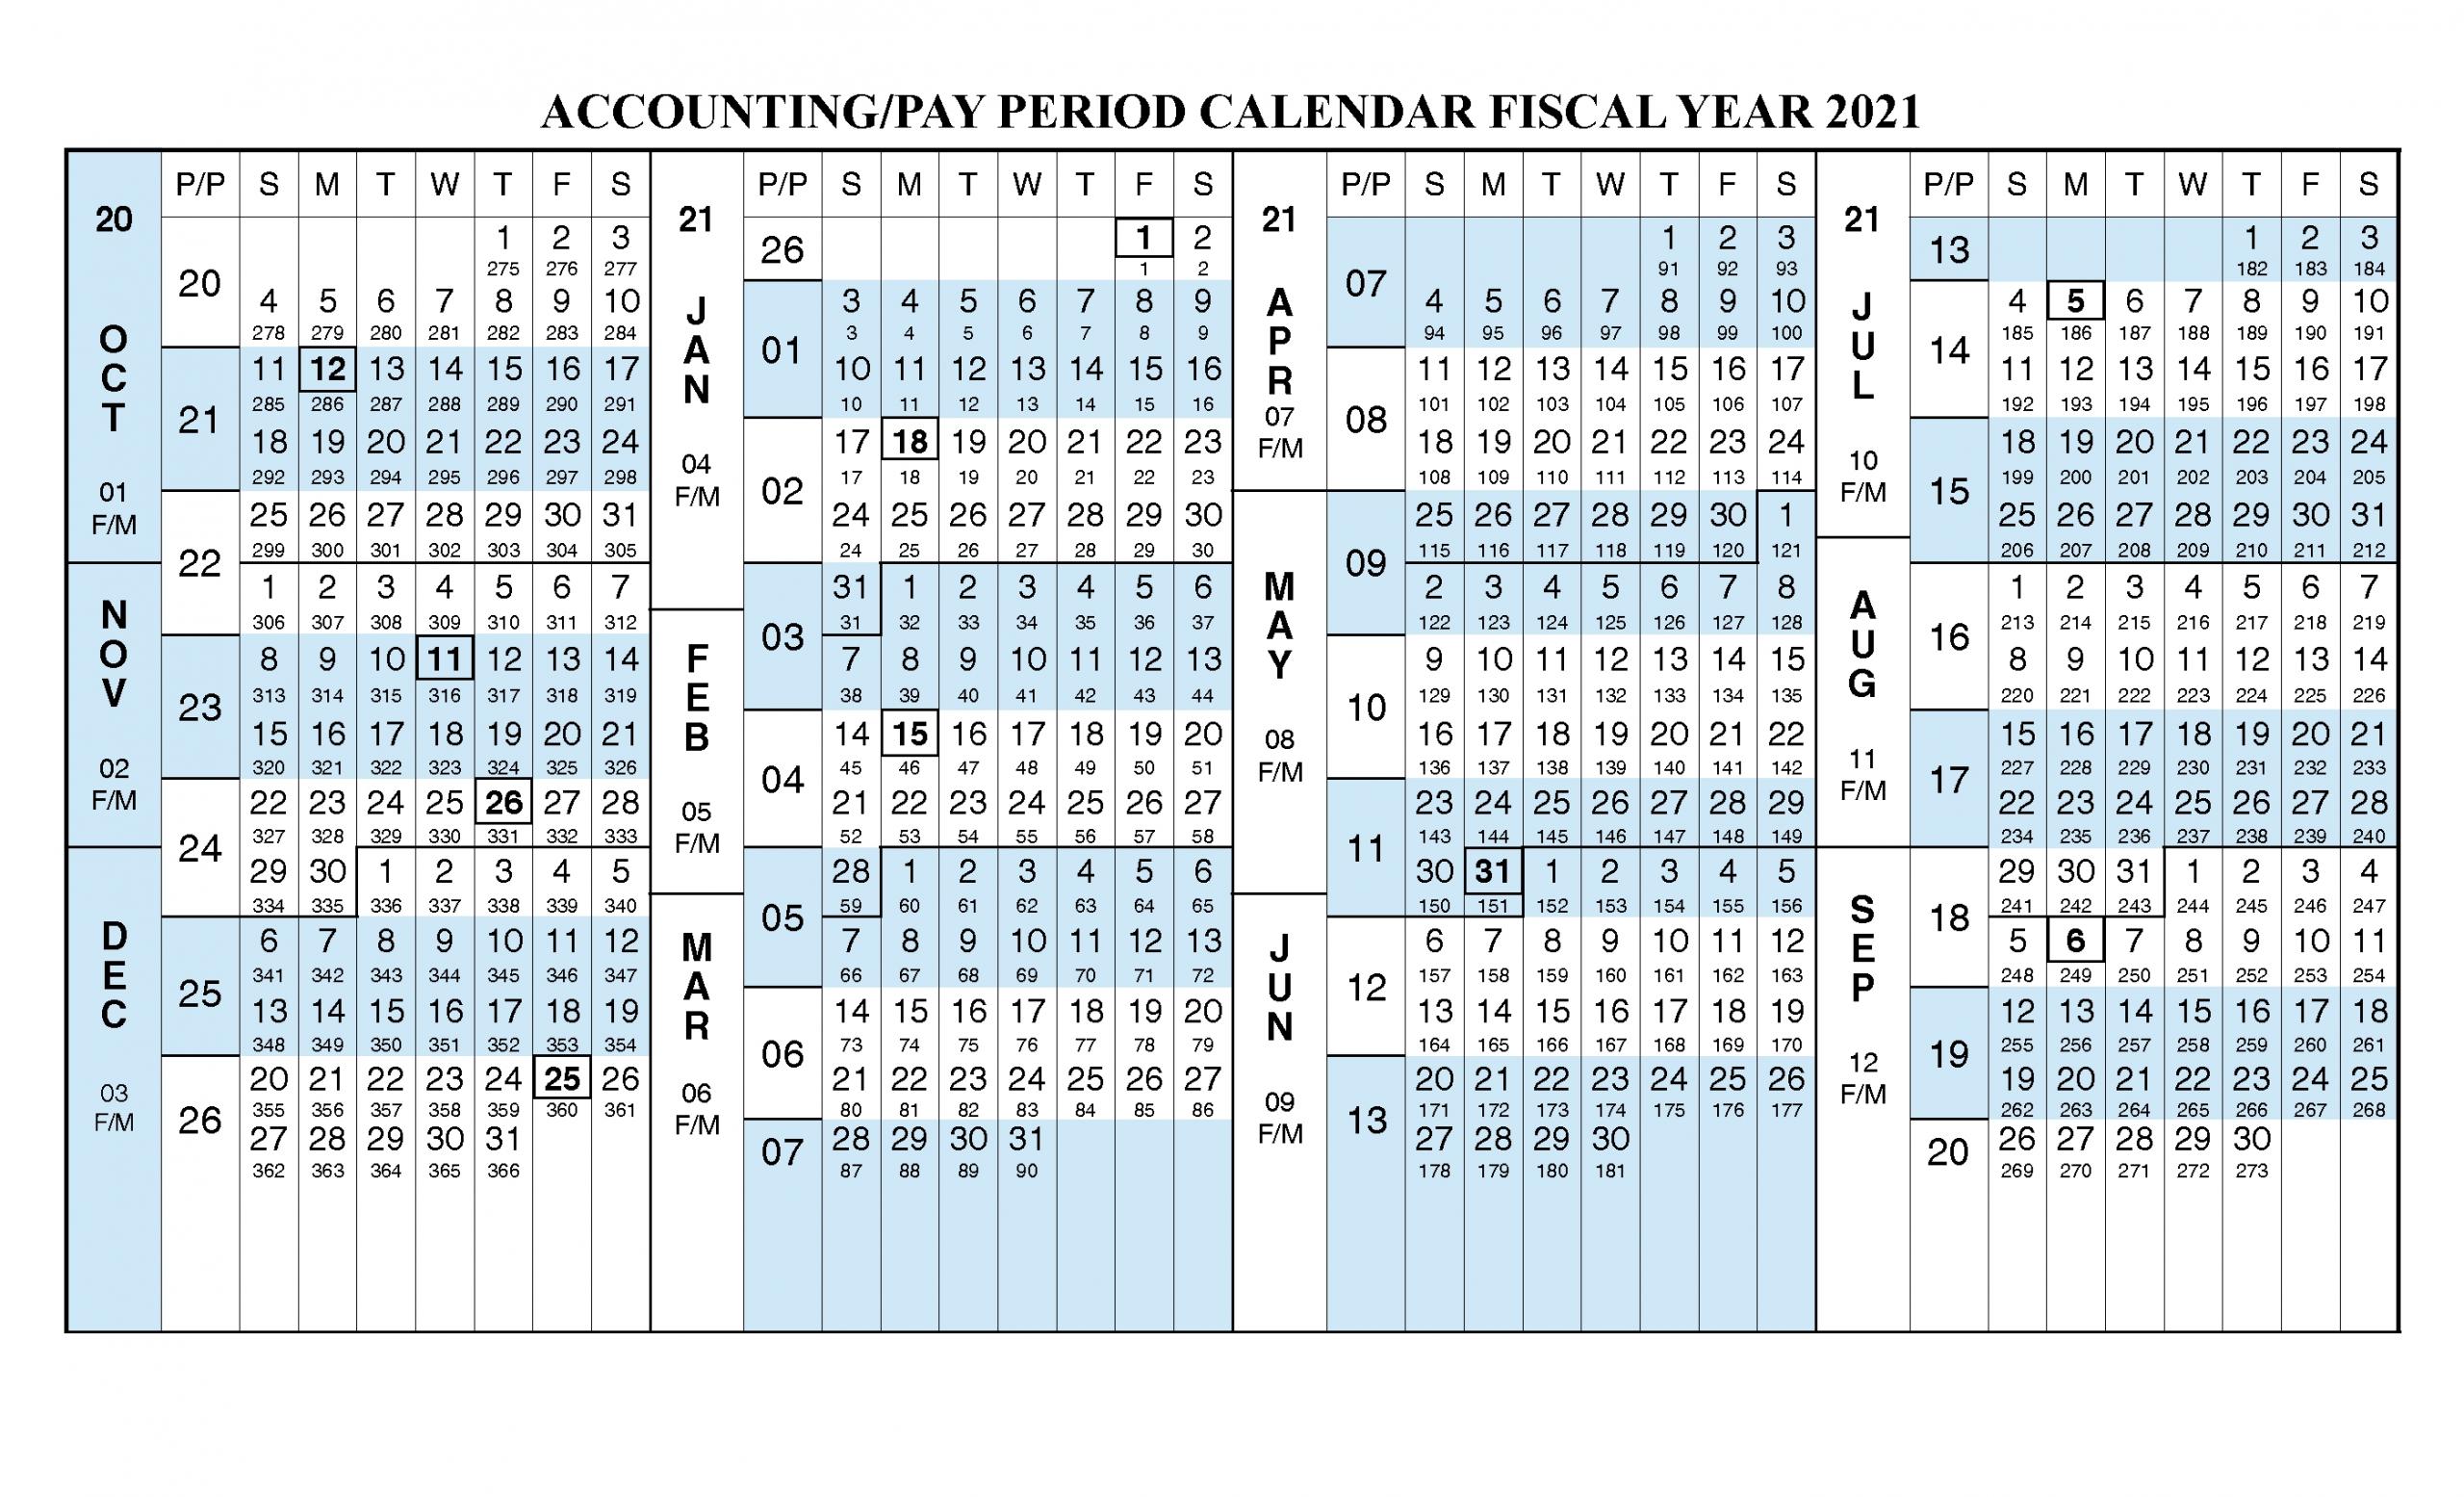 Take Financial Weeks 20 21